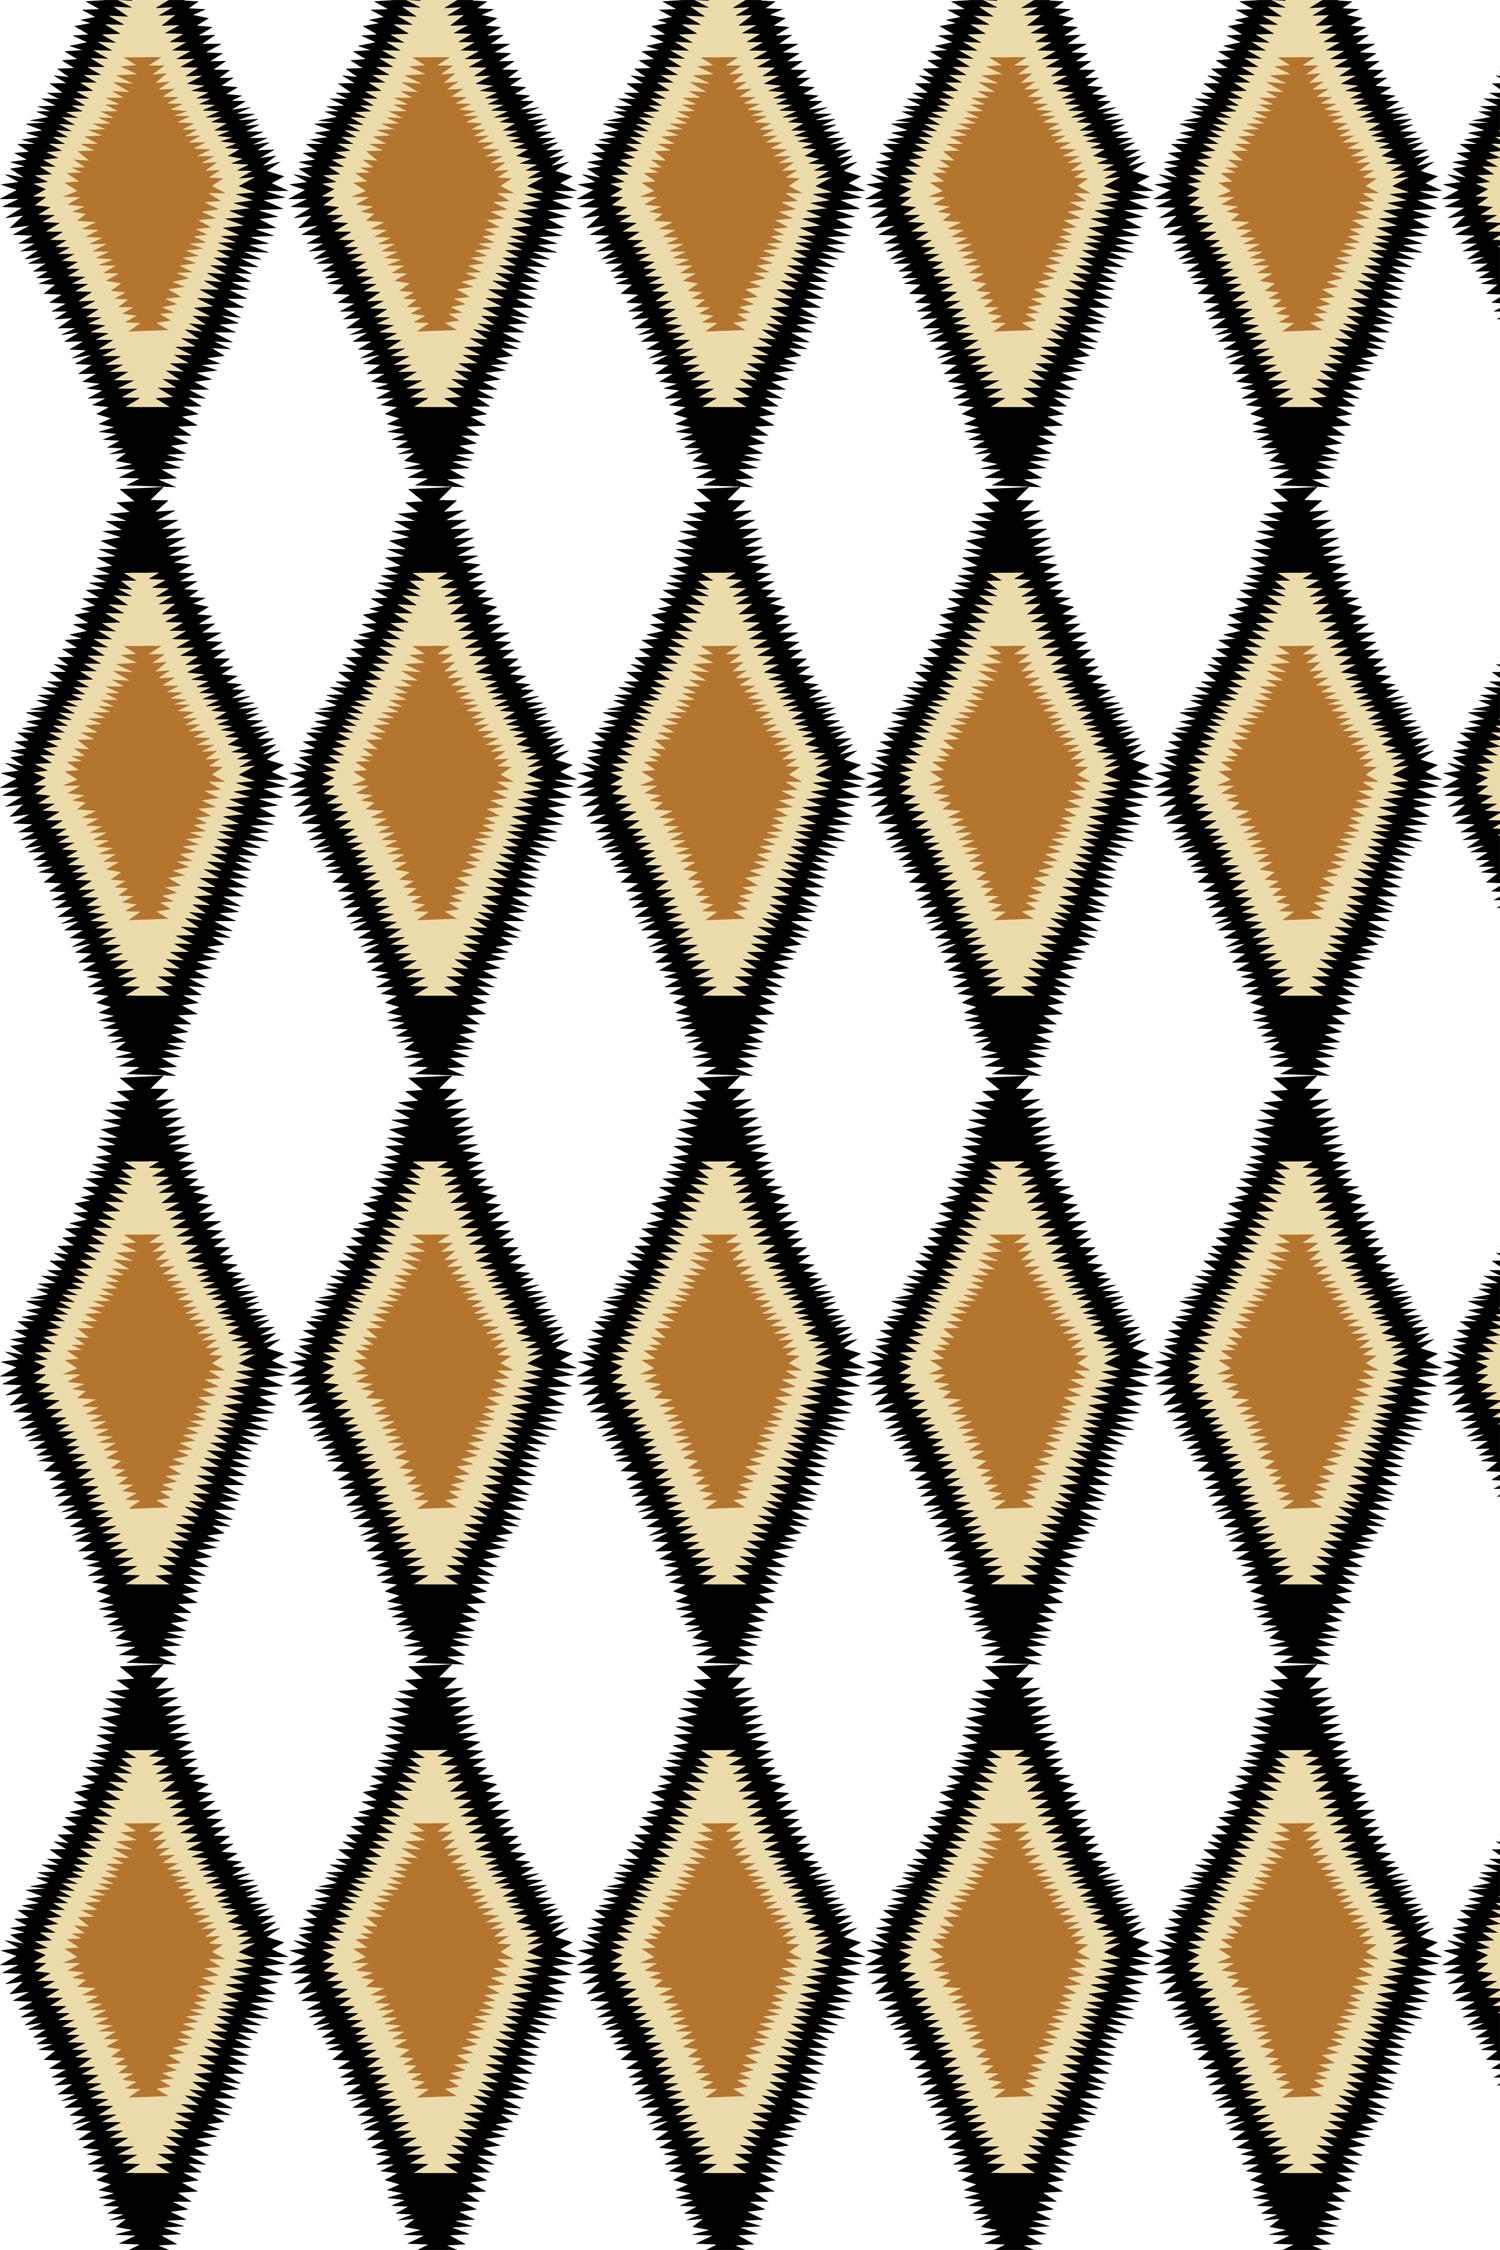 etnic print 10.jpg